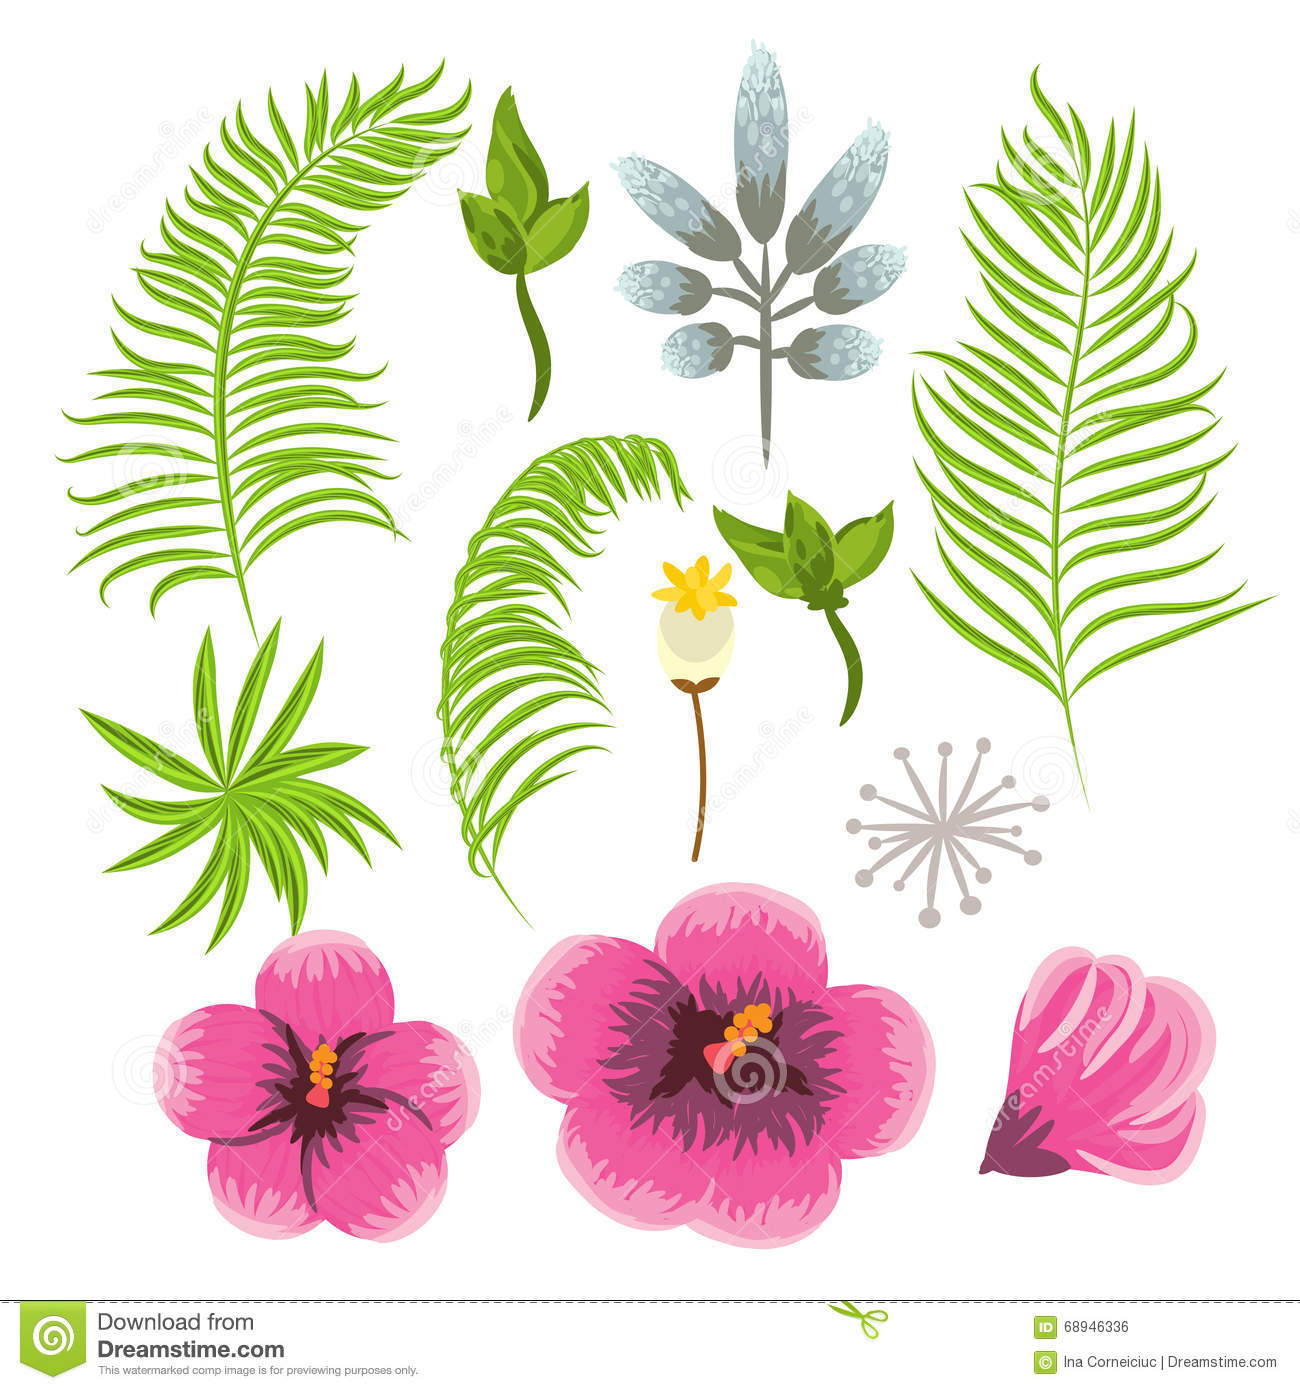 Tropical clipart green flower #2